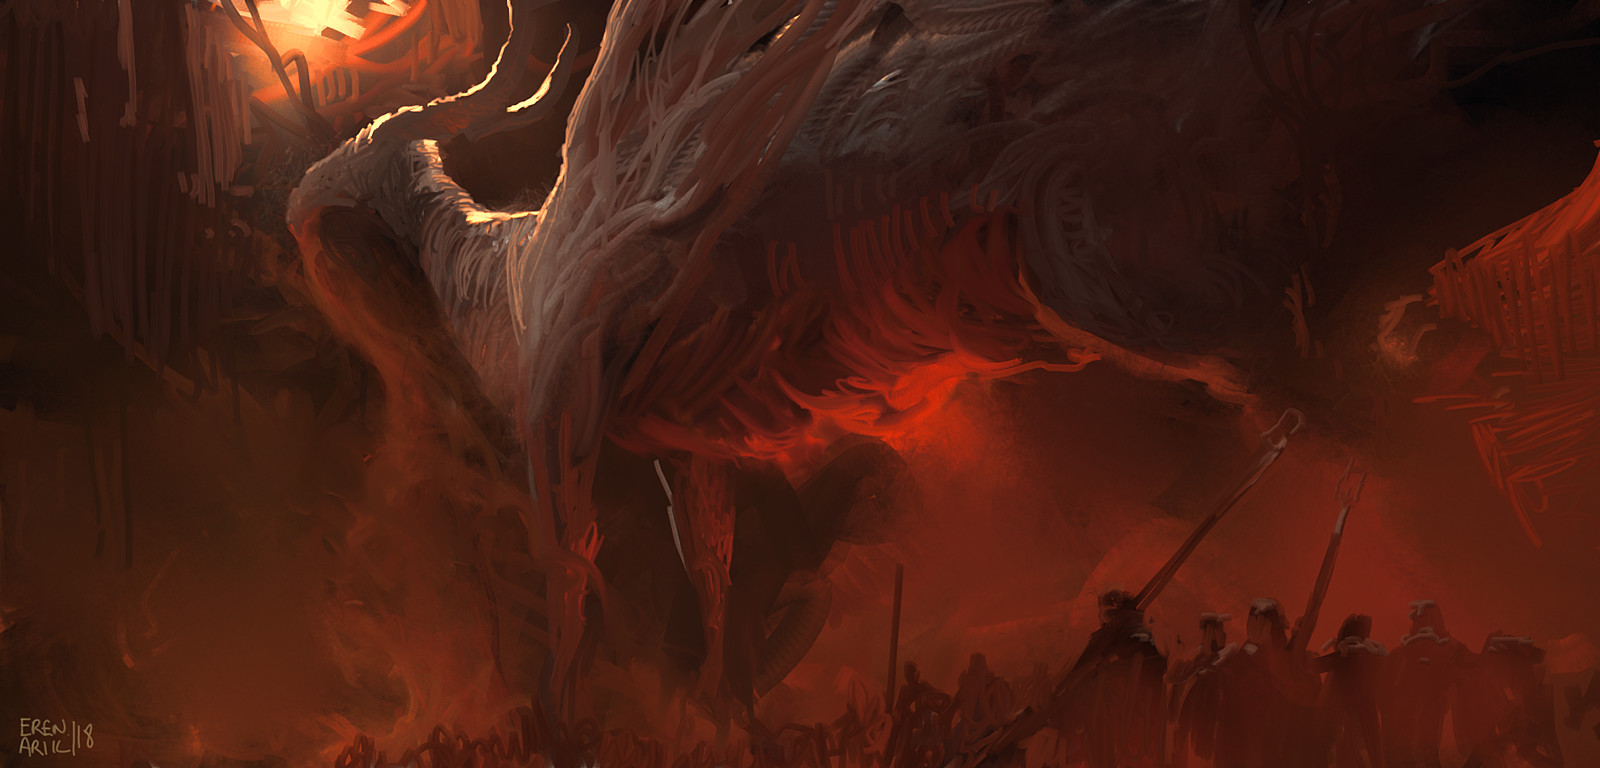 eren-arik-dragon.jpg